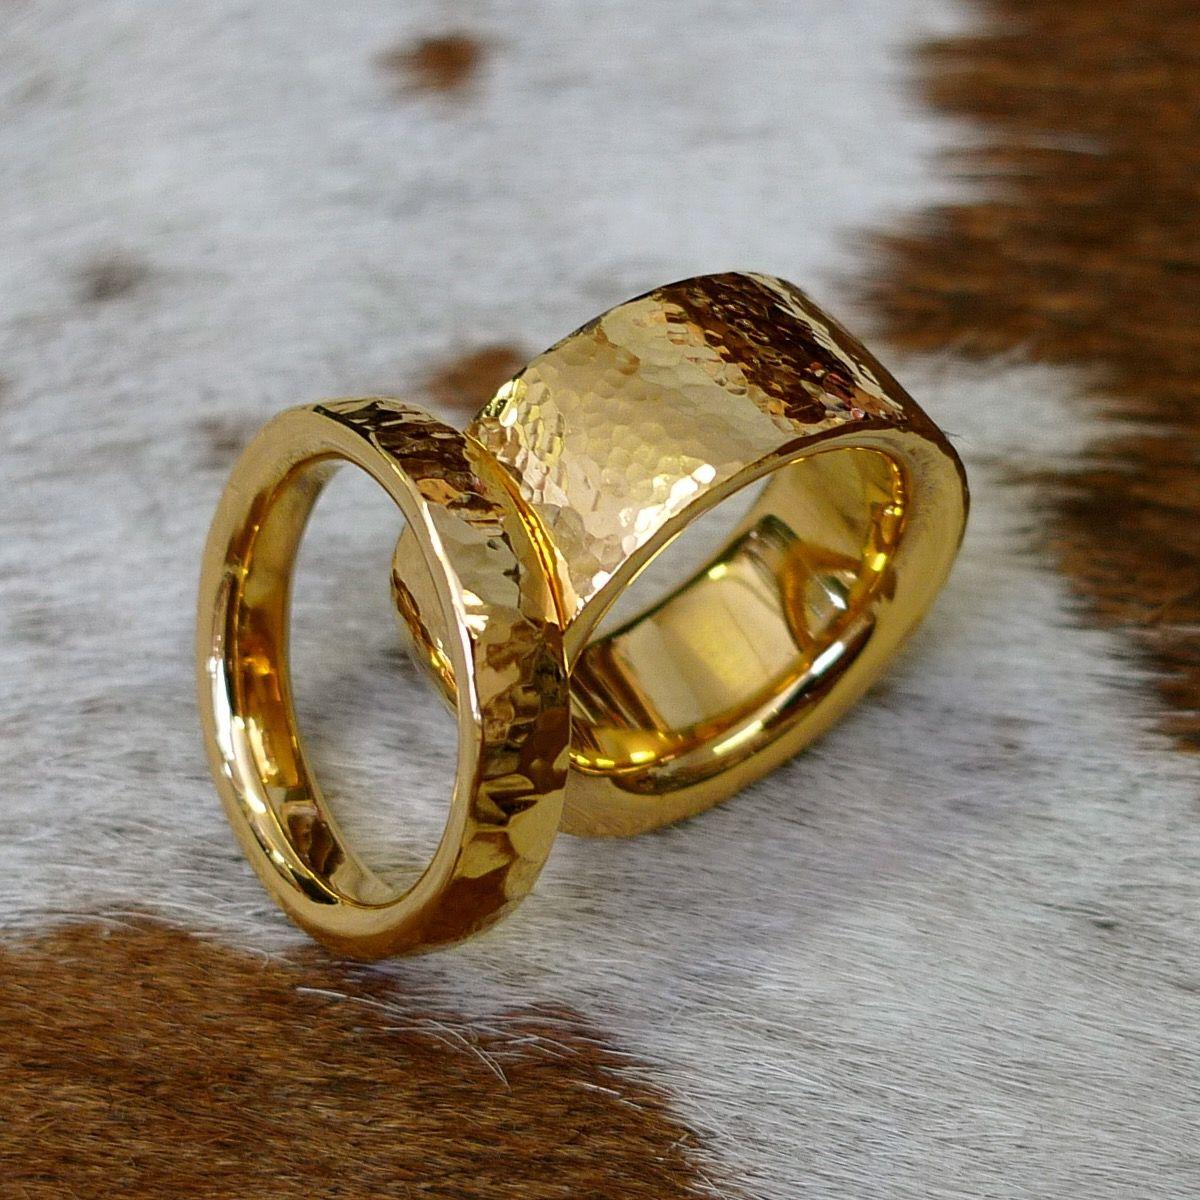 Hand made gold hammered unisex wedding rings Wedding